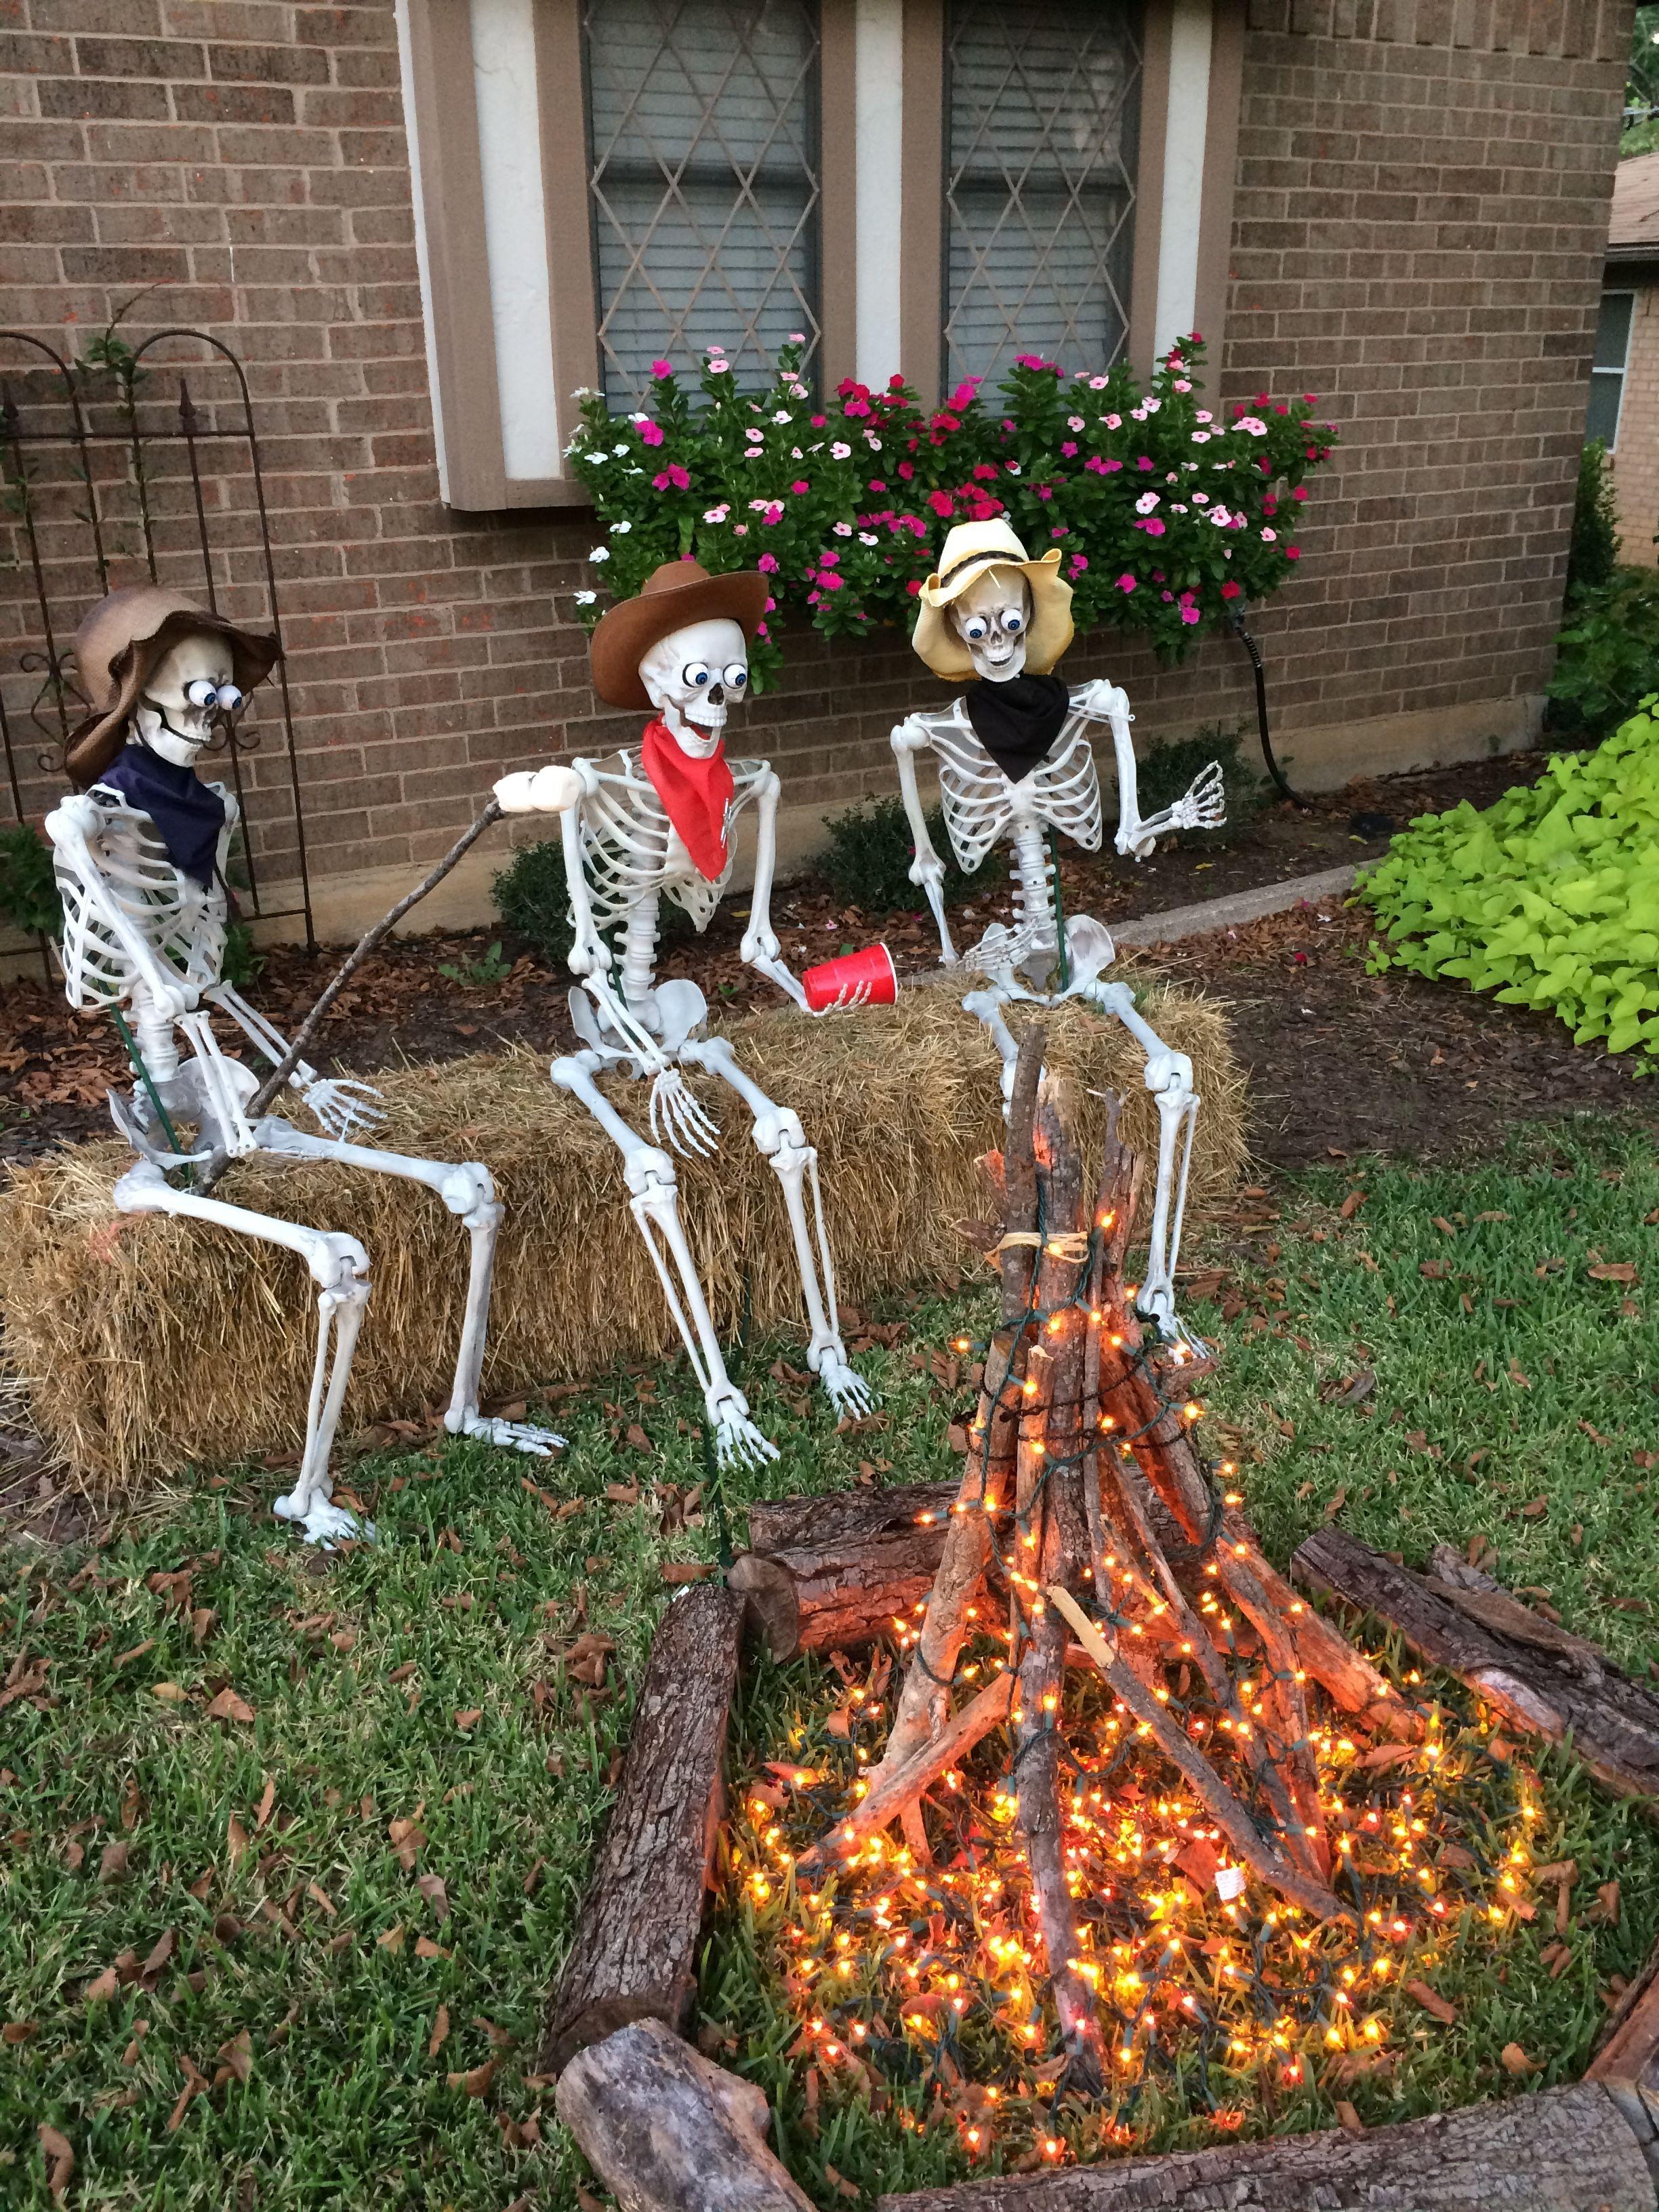 31 Scary Halloween Yard Ideas Halloween Outdoor Decorations Homemade Halloween Decorations Easy Halloween Decorations